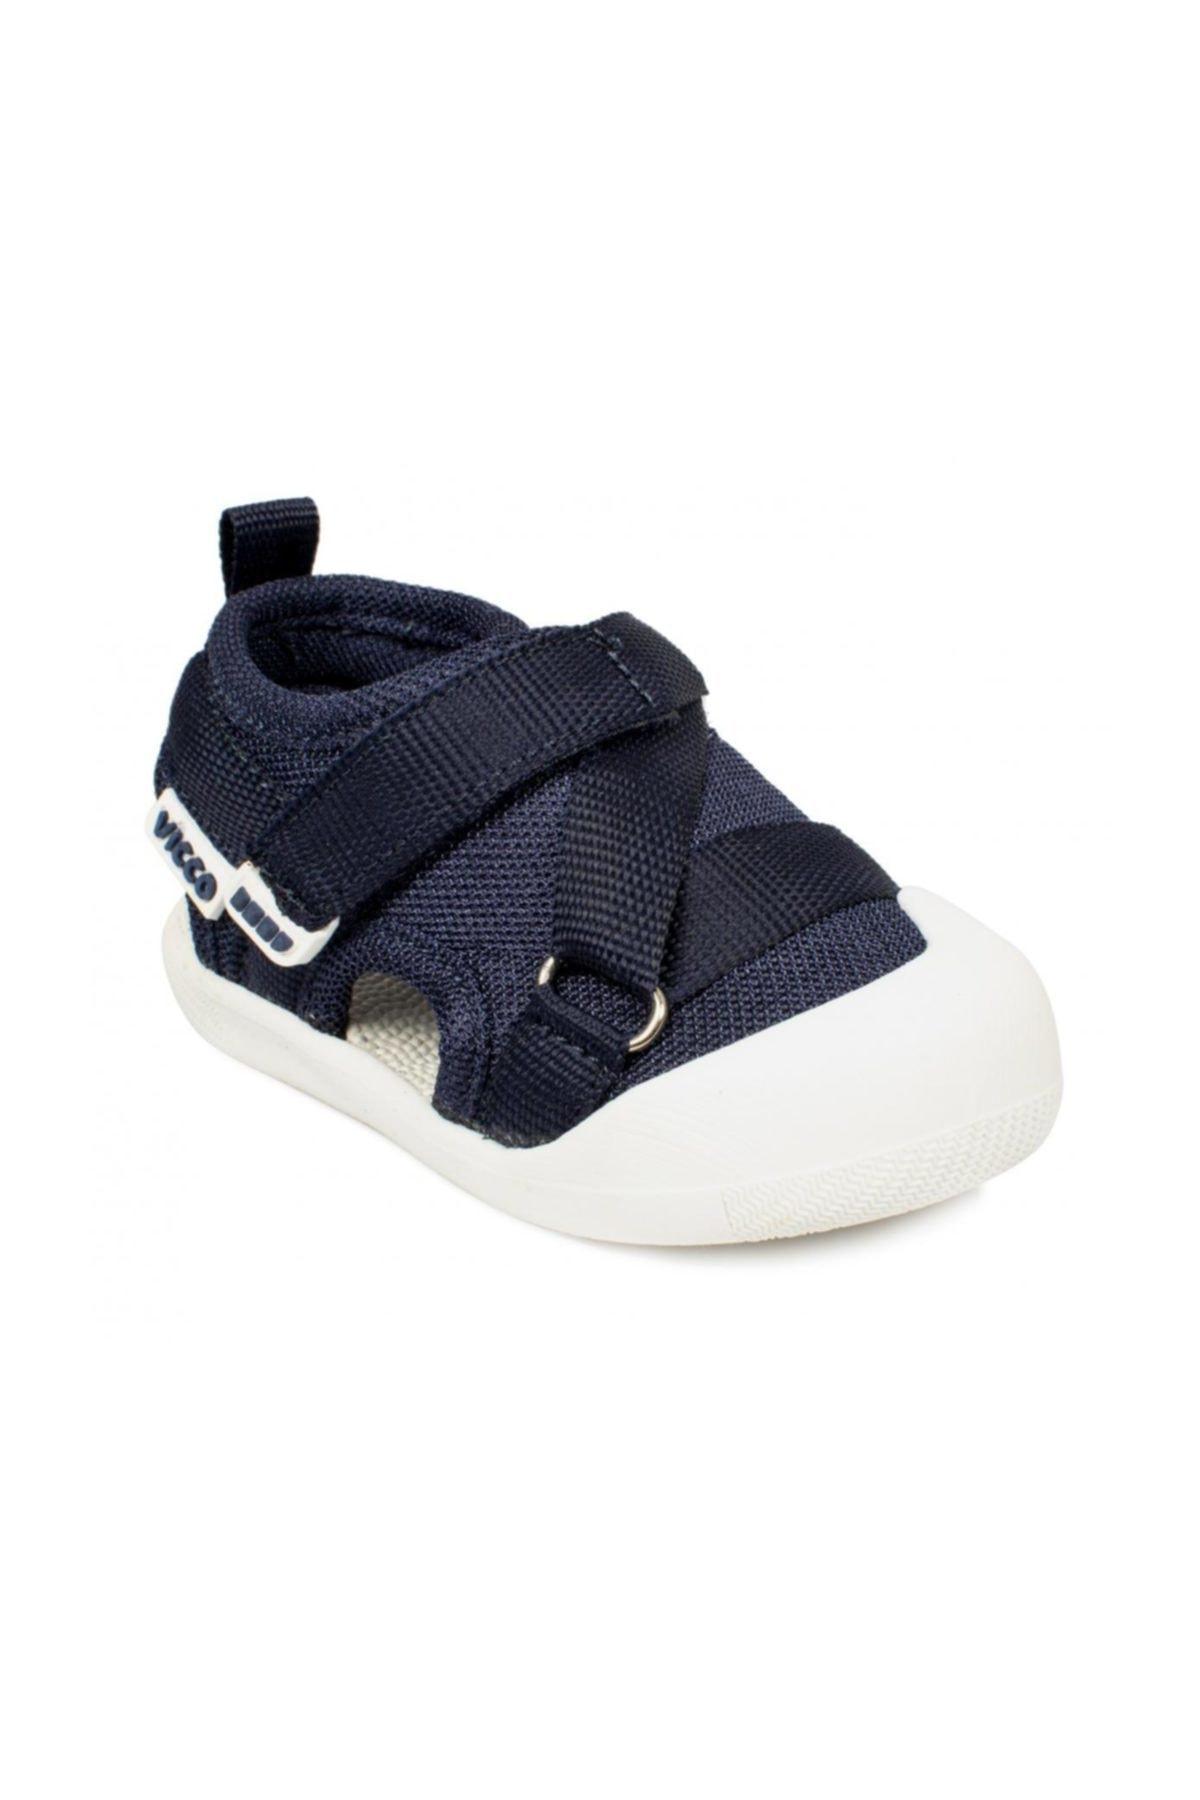 Vicco 950.E20Y.501 Lacivert Erkek Çocuk Sandalet 100579001 1